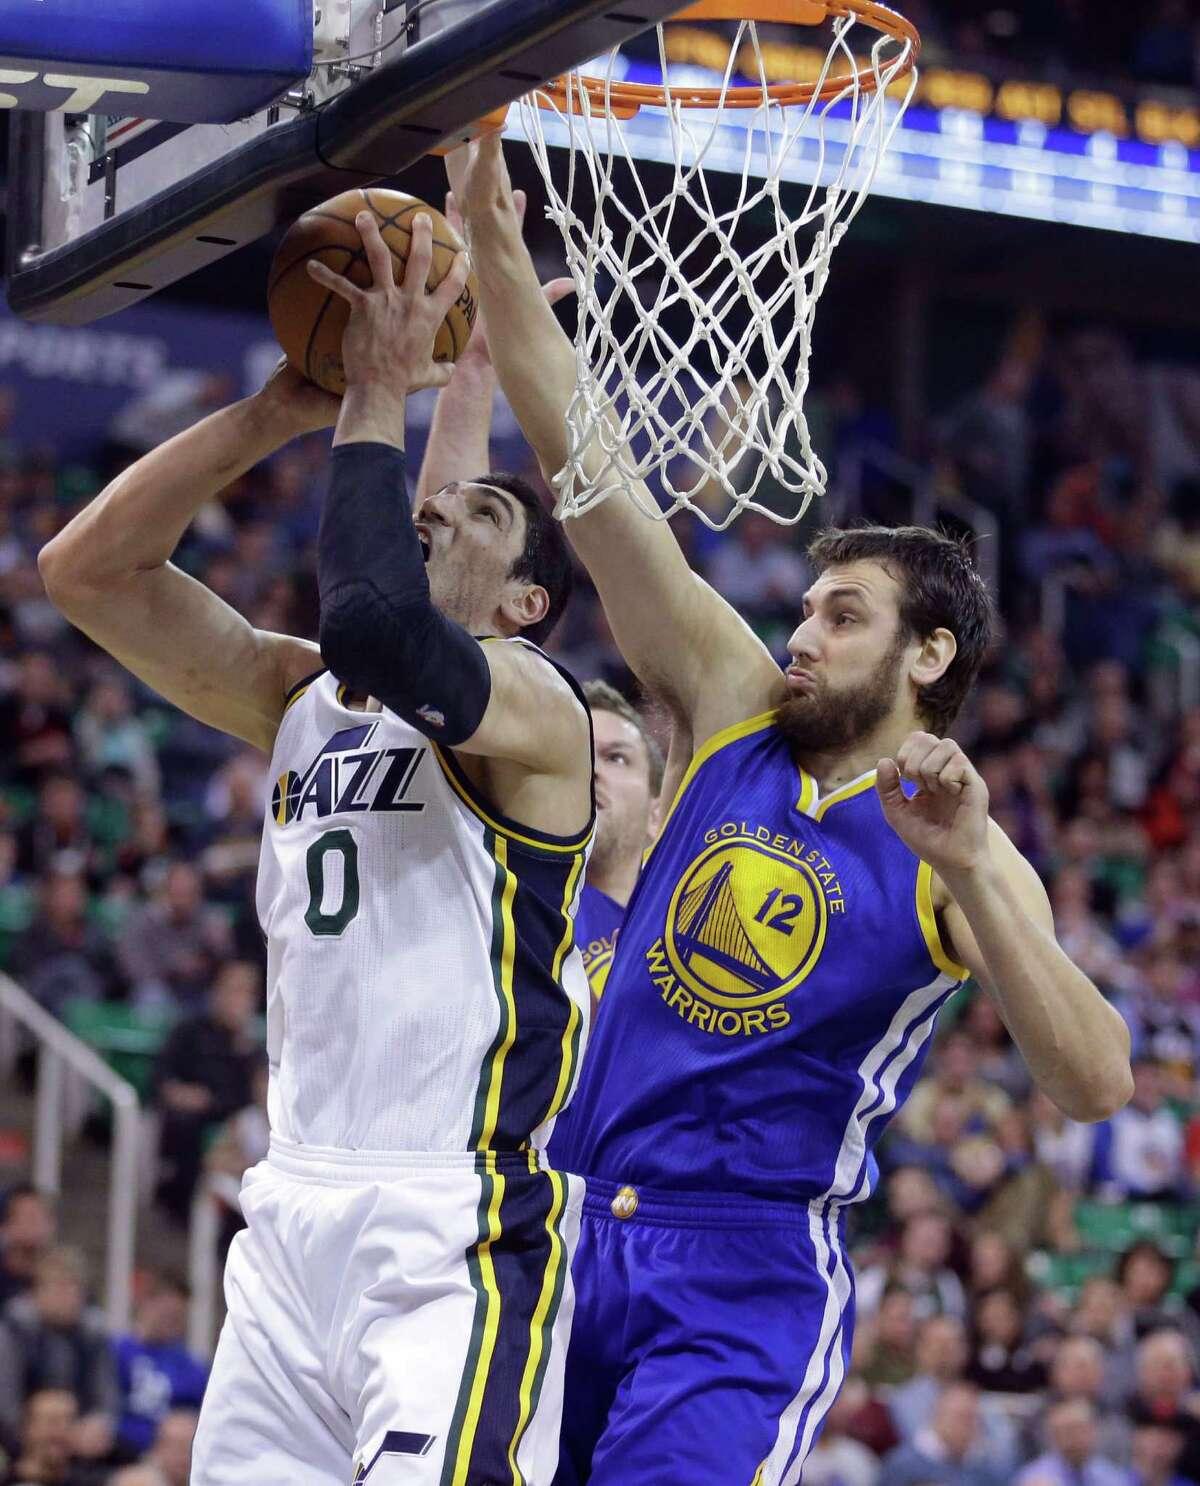 Golden State Warriors center Andrew Bogut (12) defends against Utah Jazz center Enes Kanter (0) in the second quarter during an NBA basketball game Tuesday, Jan. 13, 2015, in Salt Lake City. (AP Photo/Rick Bowmer)